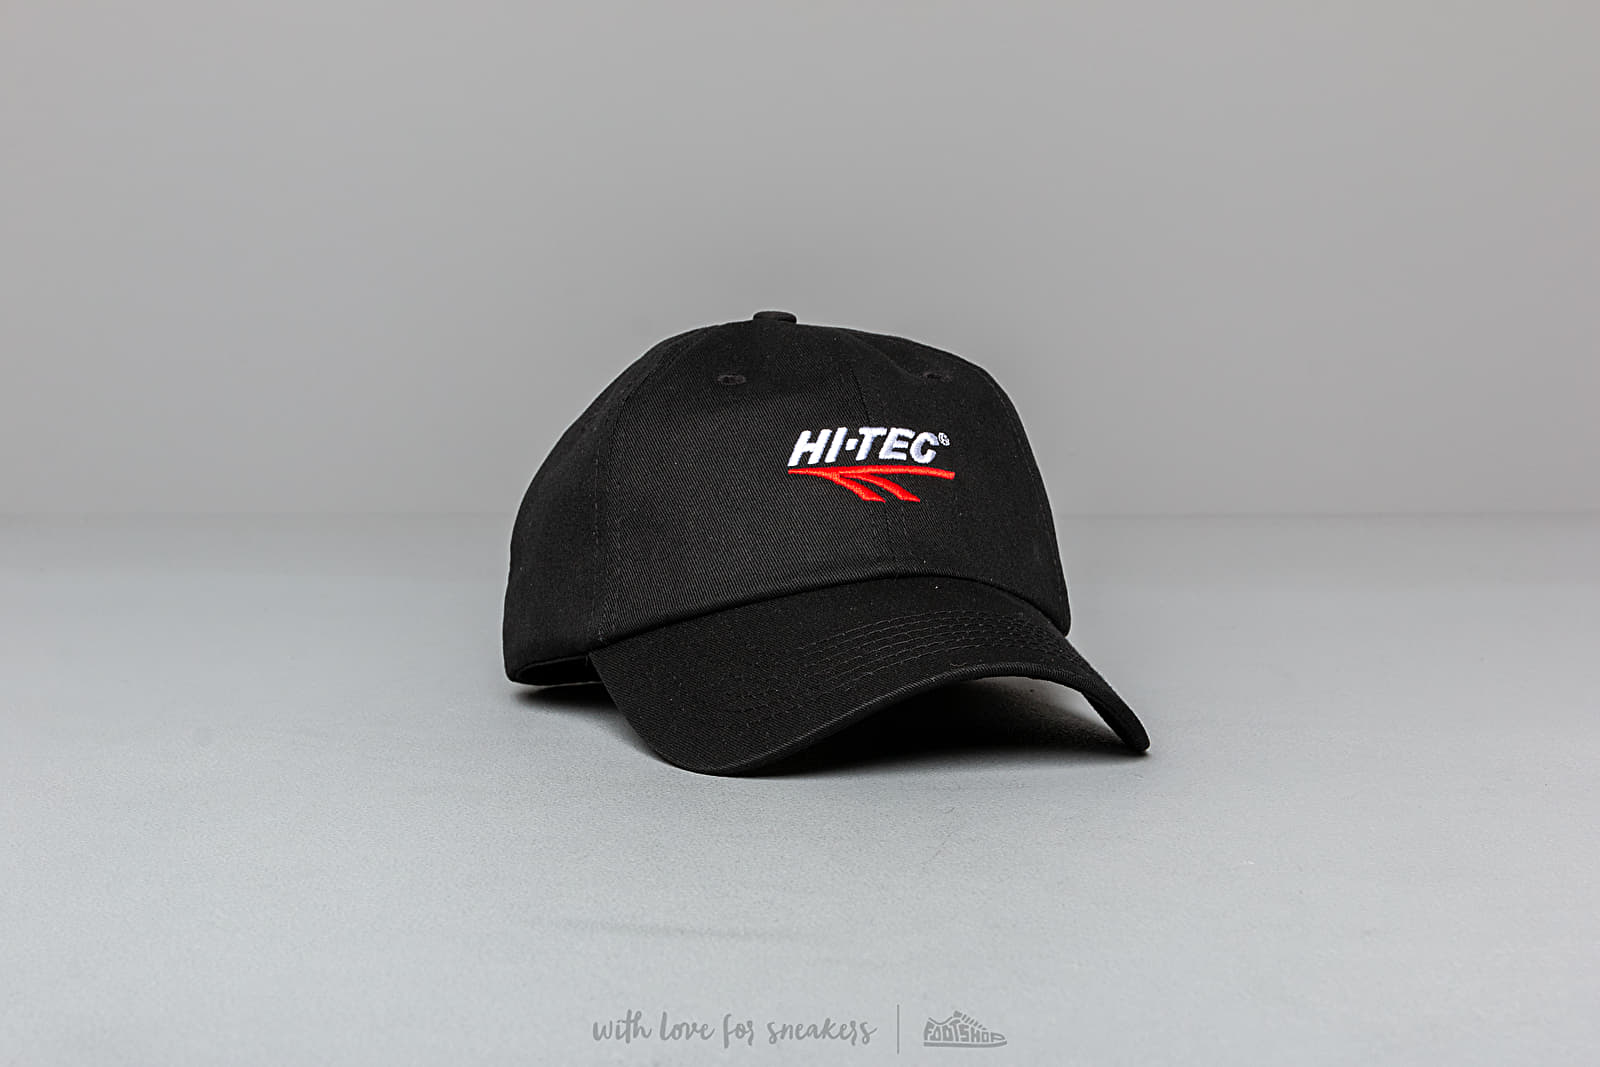 PACCBET x HI-TEC Cap Black za skvelú cenu 29 € kúpite na Footshop.sk